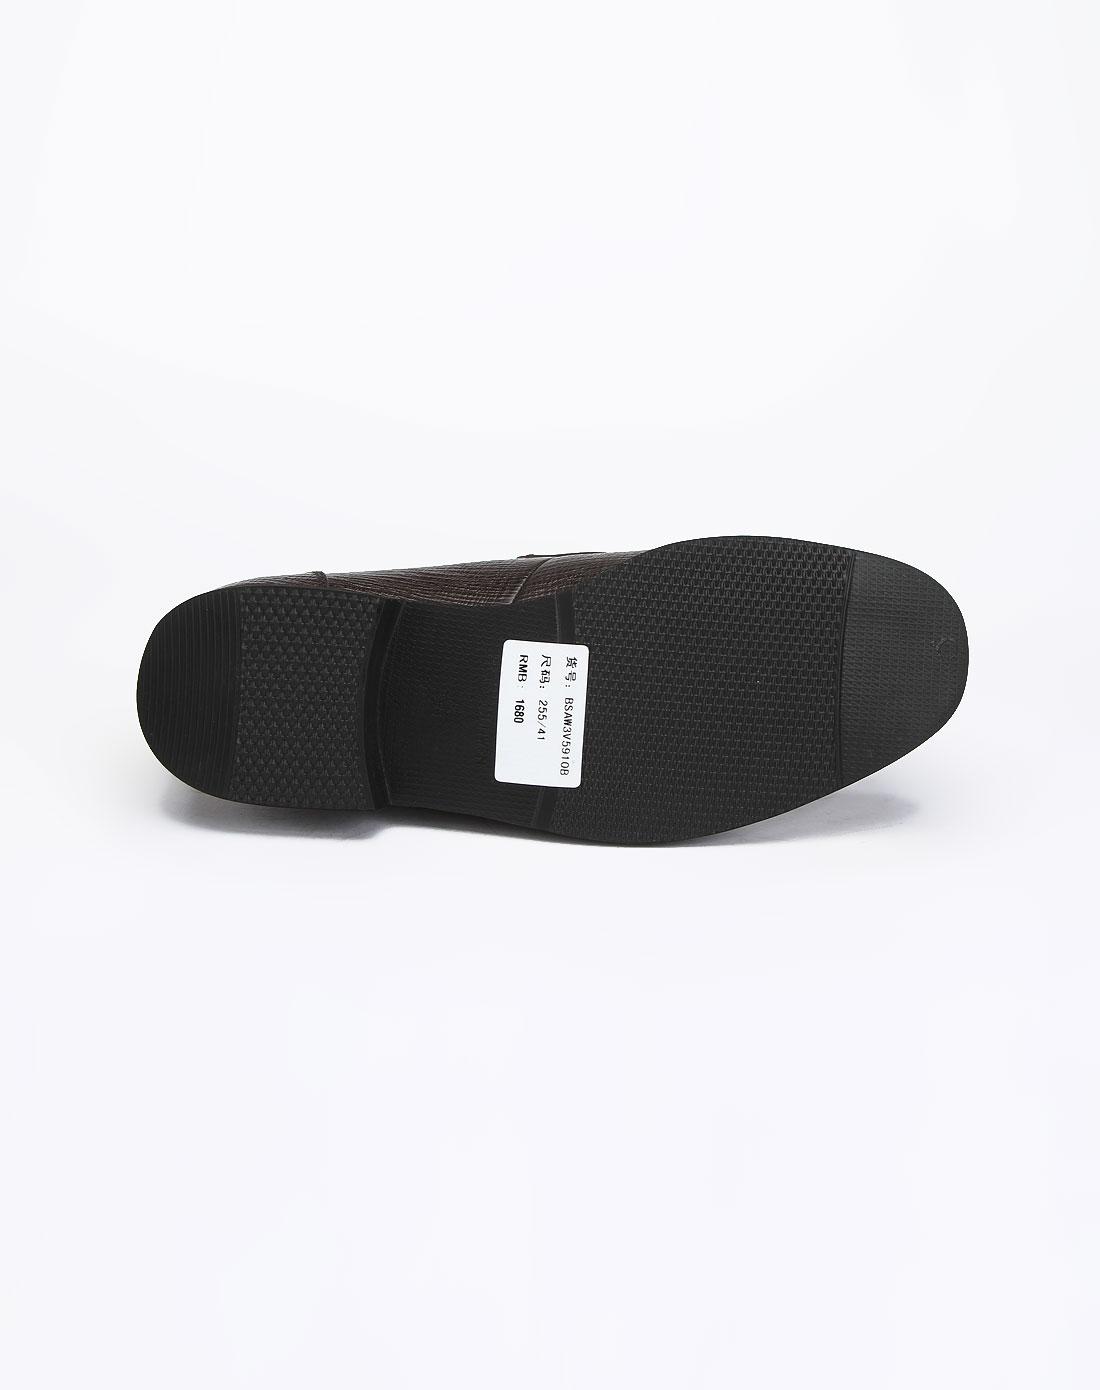 bosssunwen男装咖啡色时尚尊贵简约压纹商务皮鞋